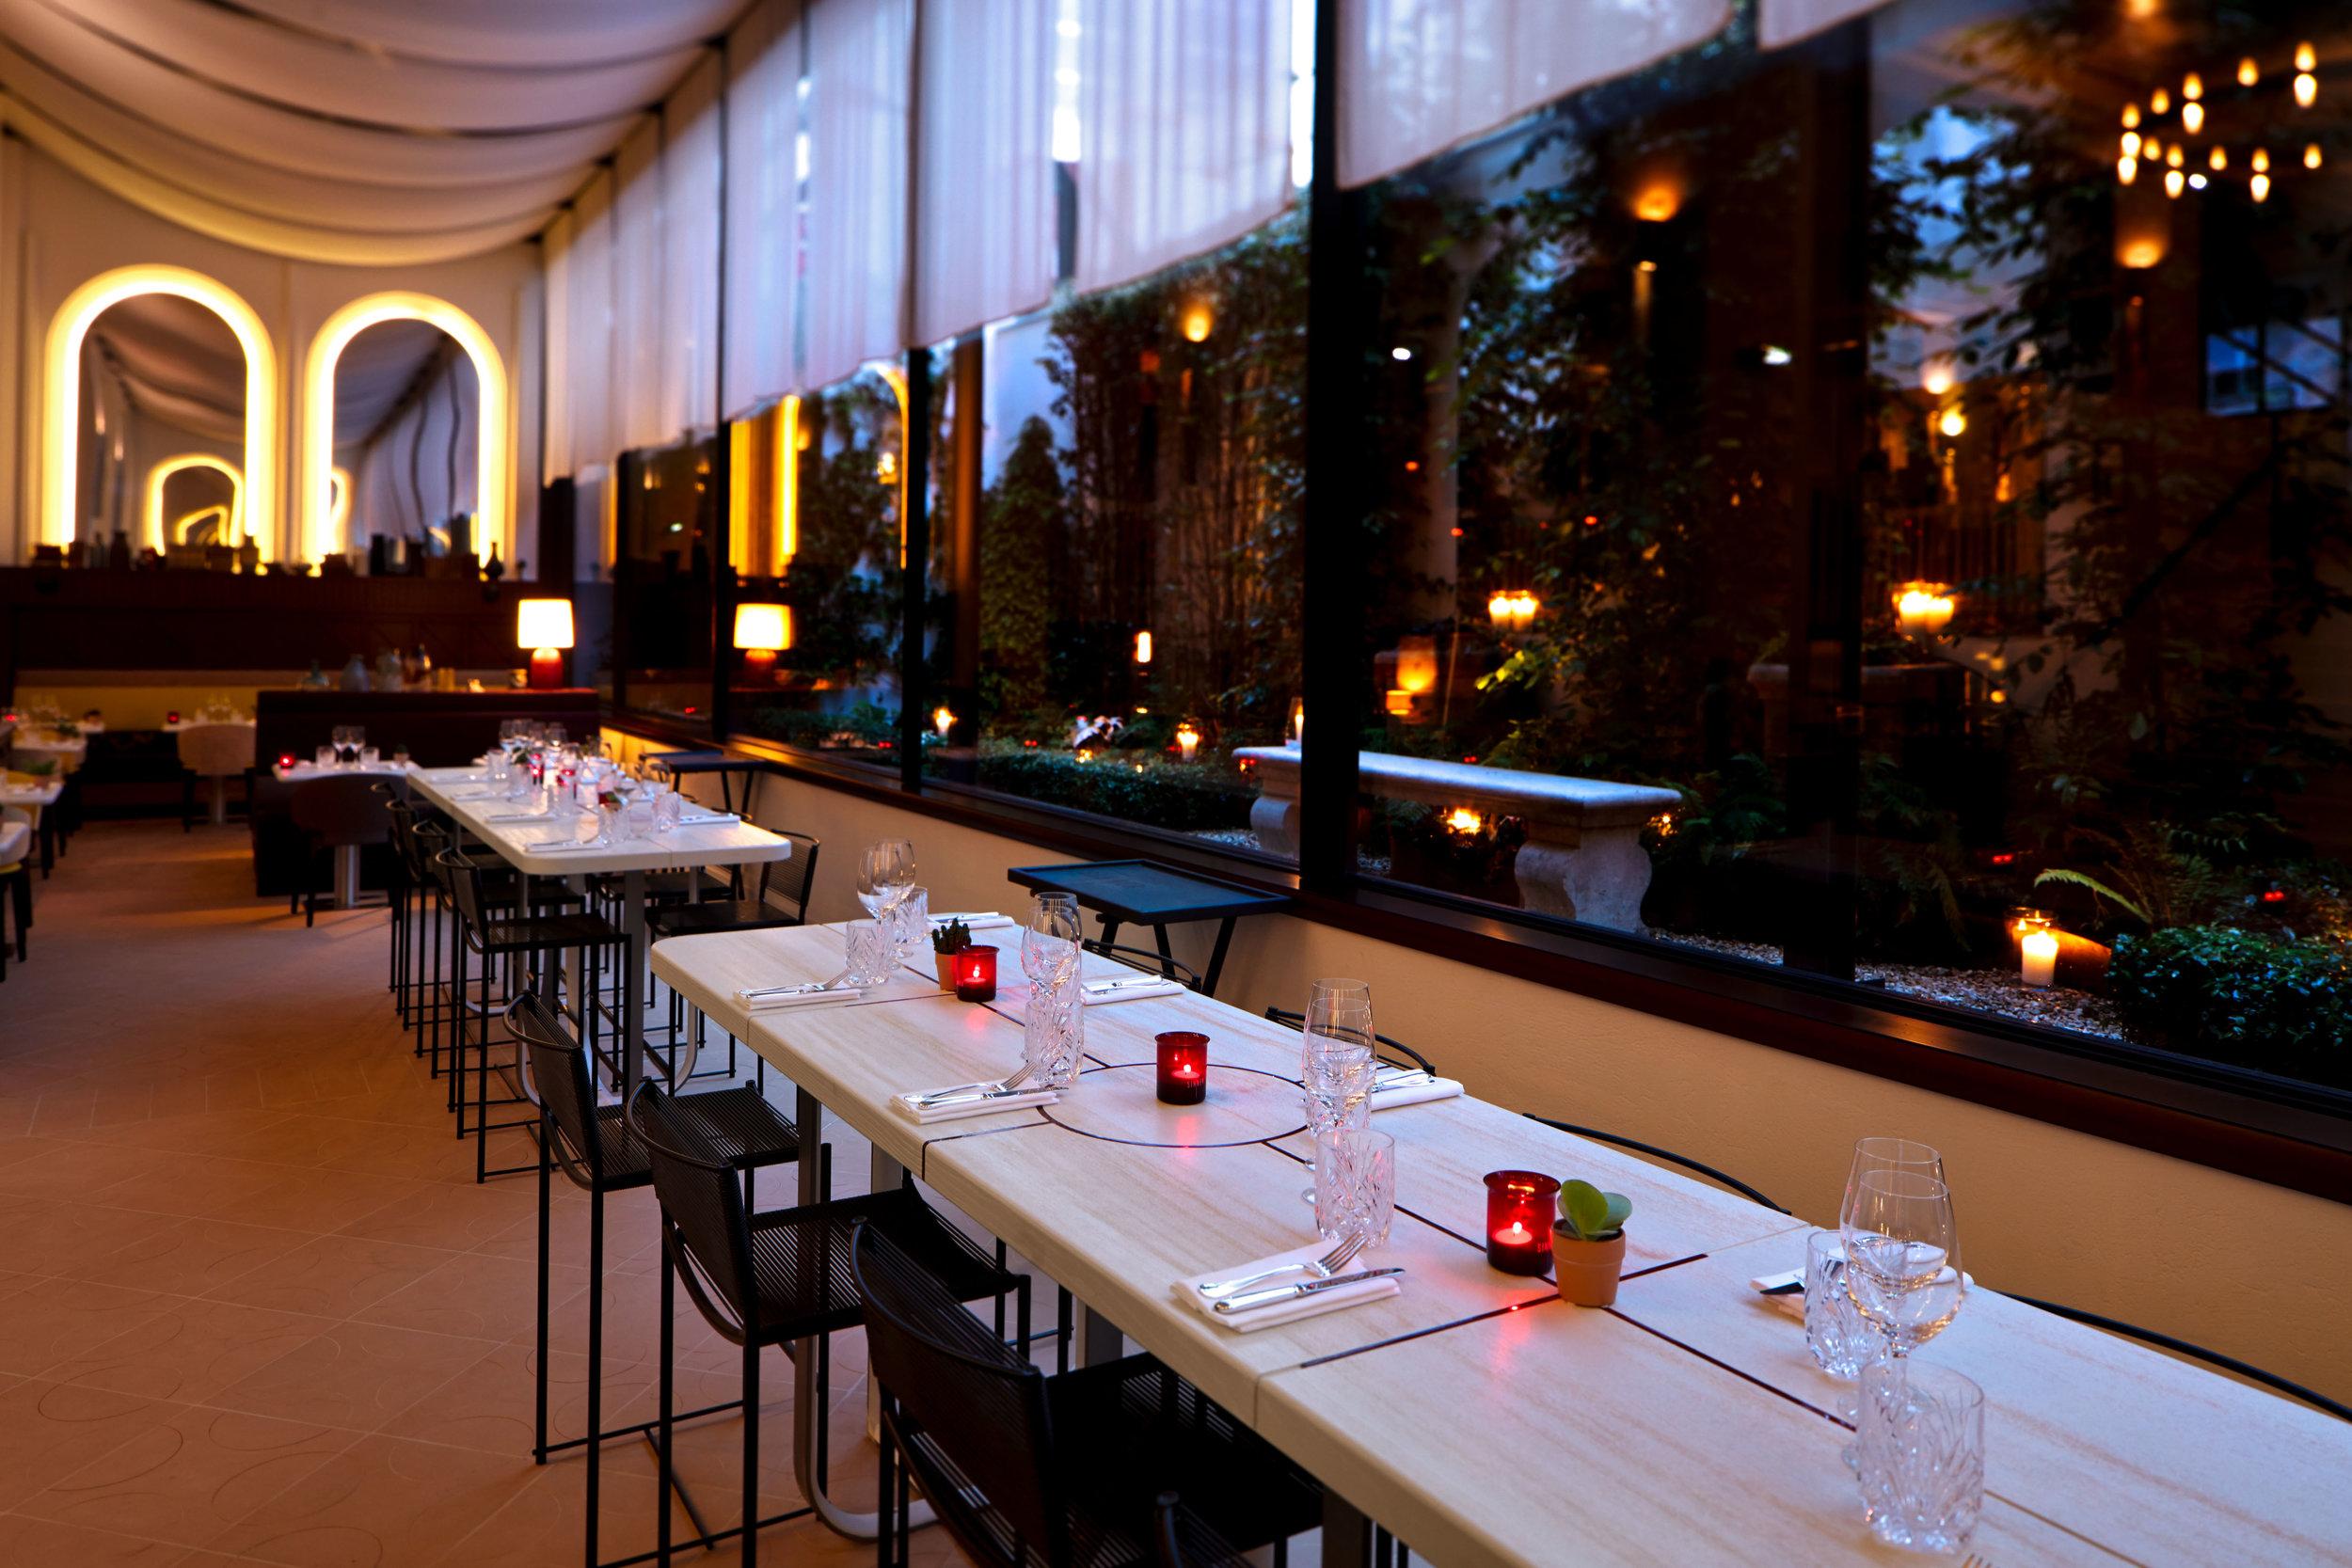 14 - Restaurant_Nicolas_Receveur.jpg